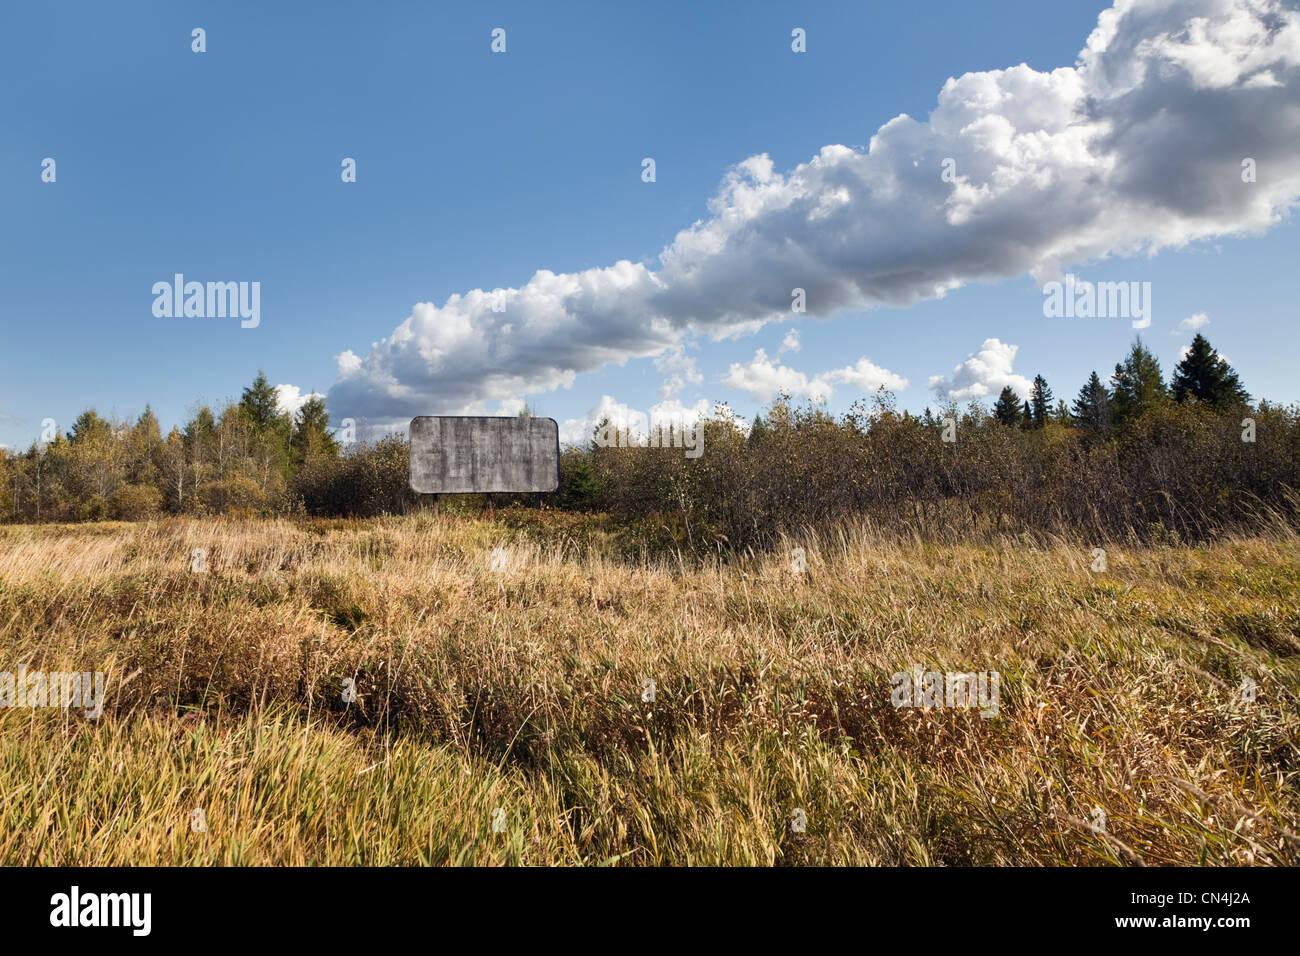 Old billboard in a field - Stock Image